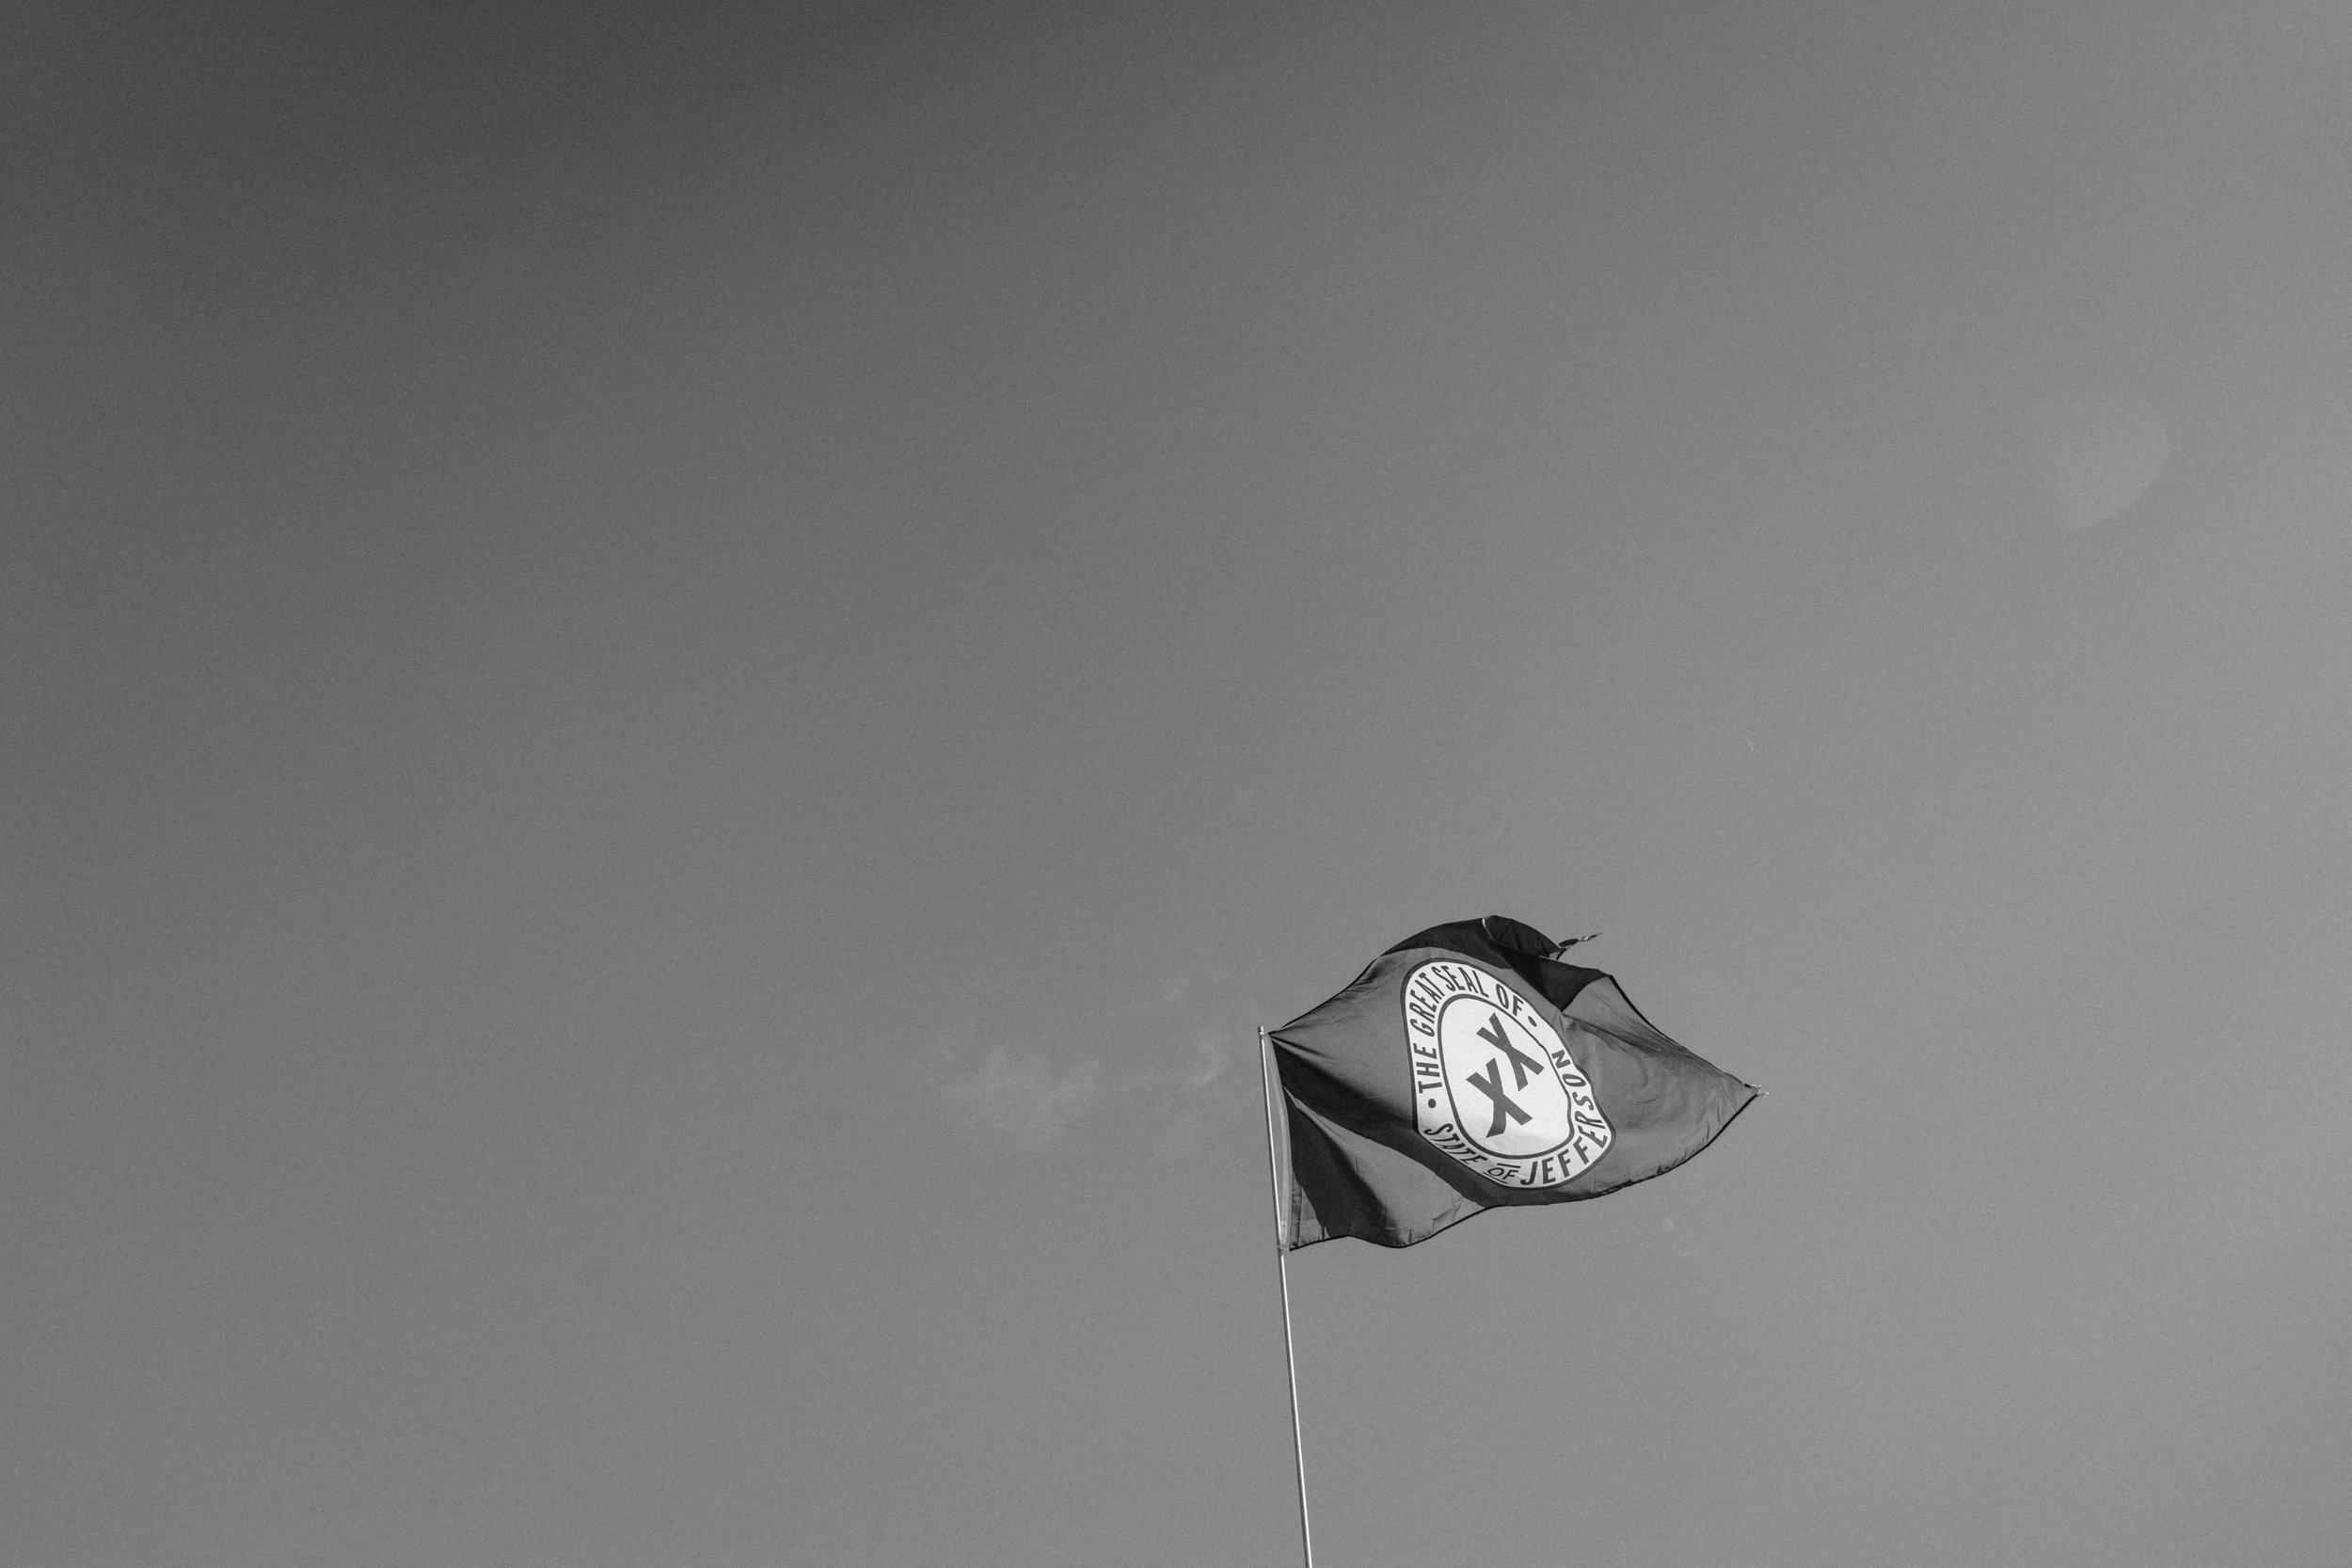 josue-rivas-yreka-culture-crush-state-of-jefferson-flag.jpg